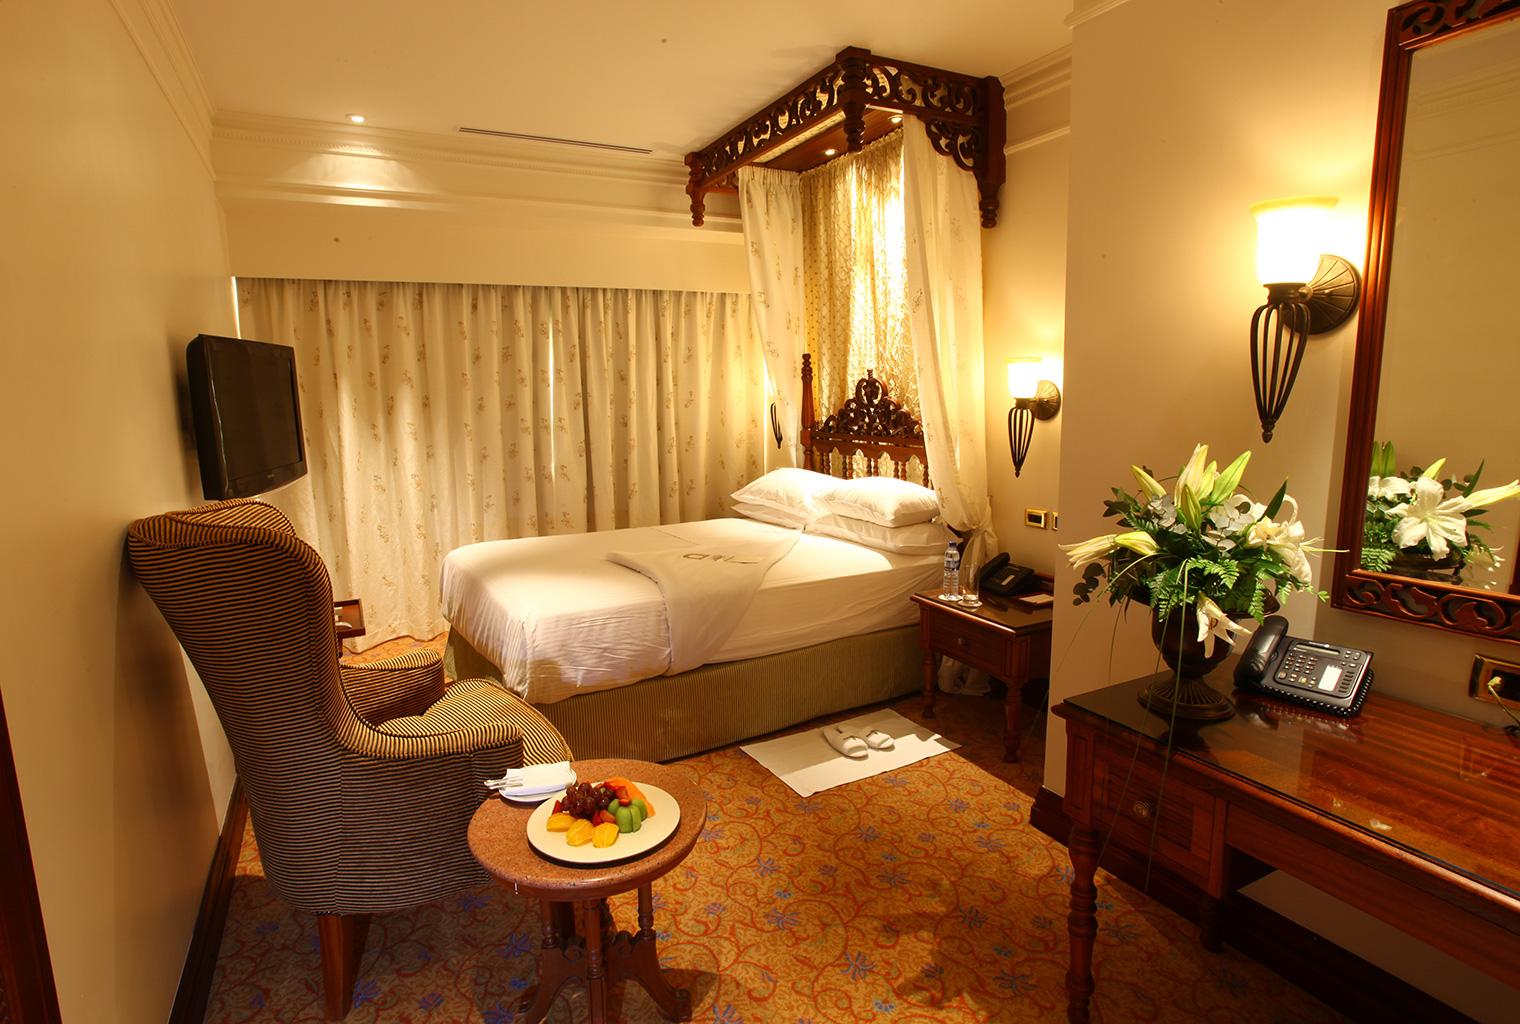 Polana-Serena-Hotel-Mozambique-Bedroom